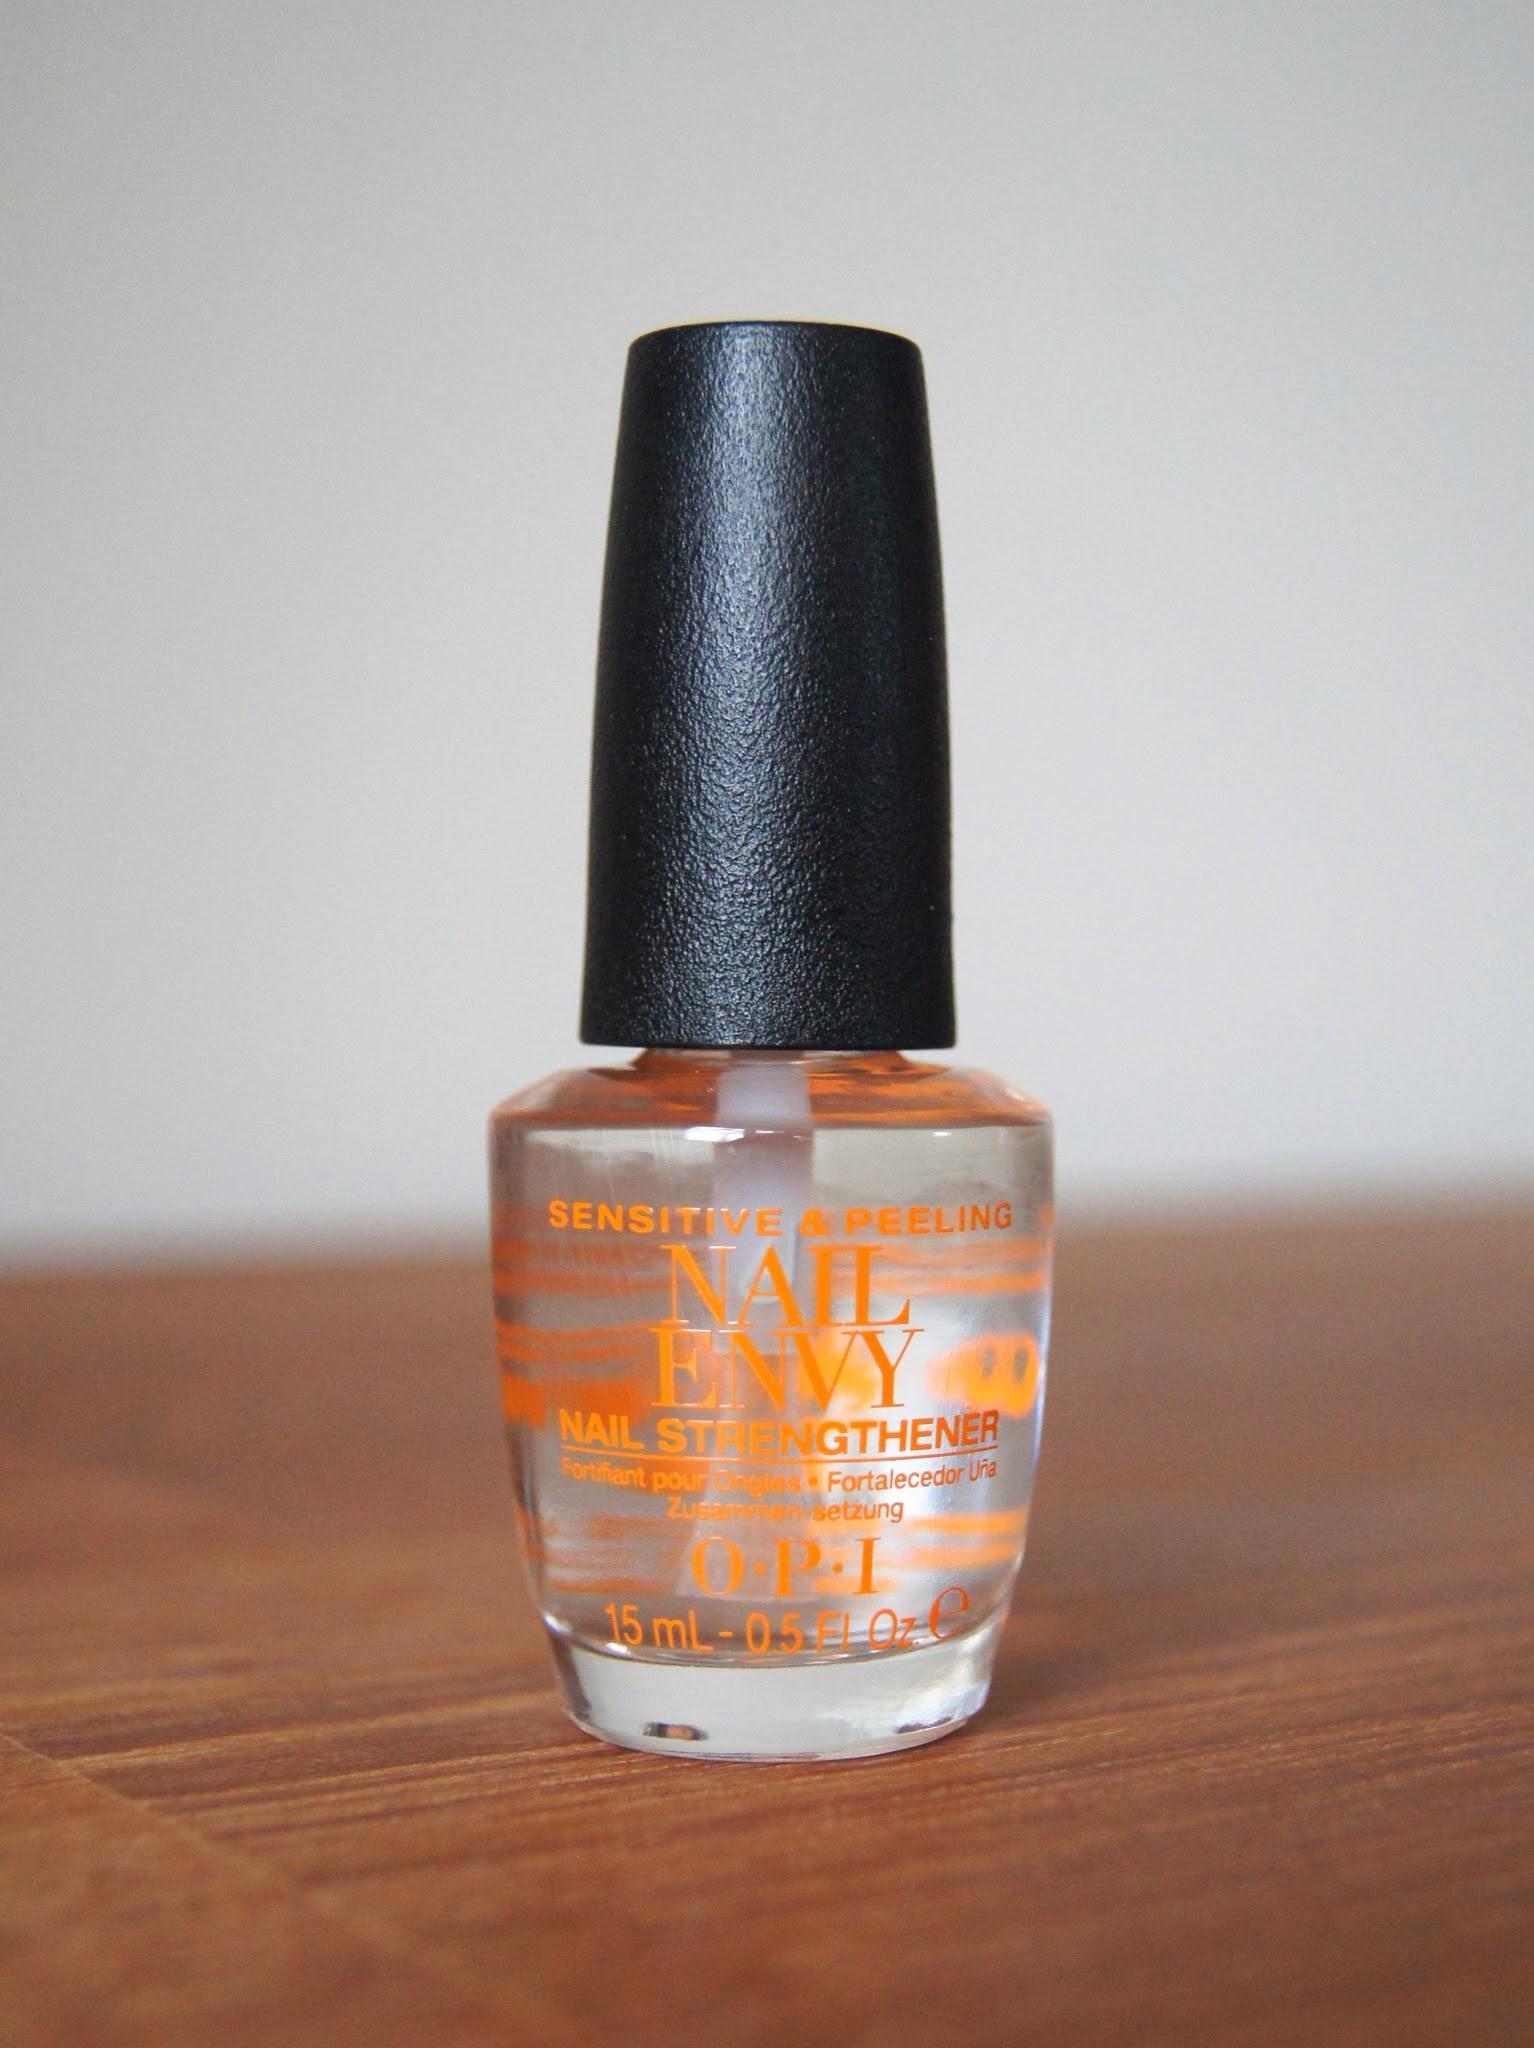 OPI Nail Envy Sensitive Peeling Nail Strengthener Review